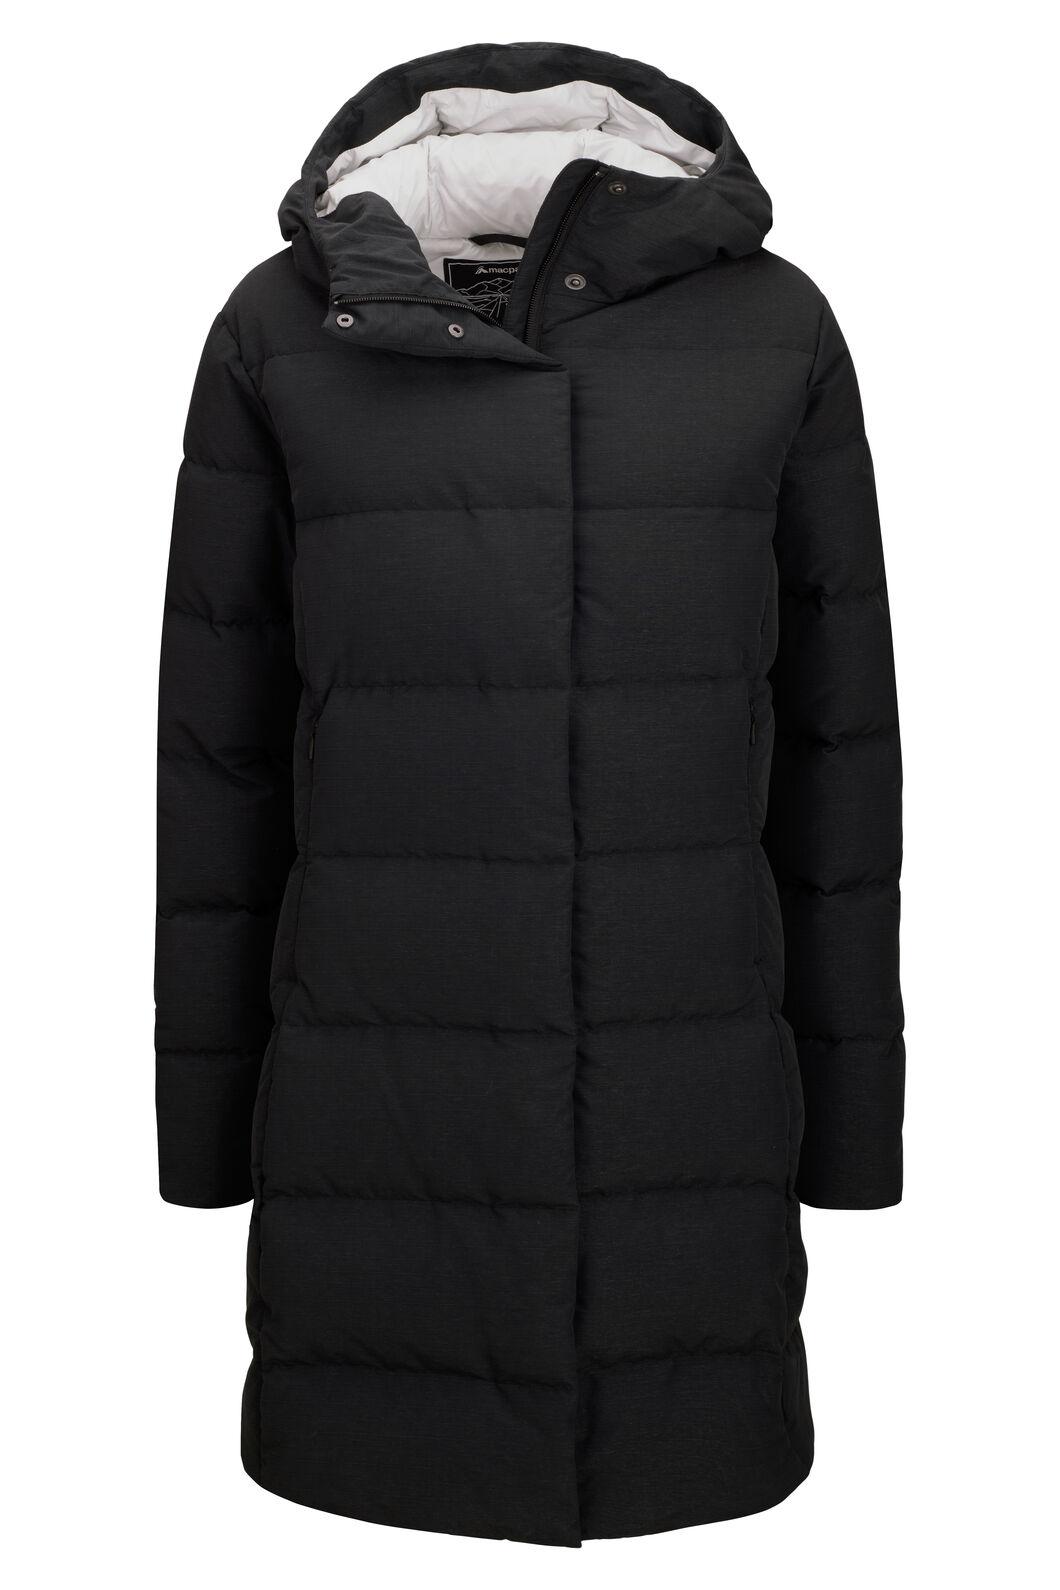 Macpac Women's Zora Hooded Down Coat, Black, hi-res